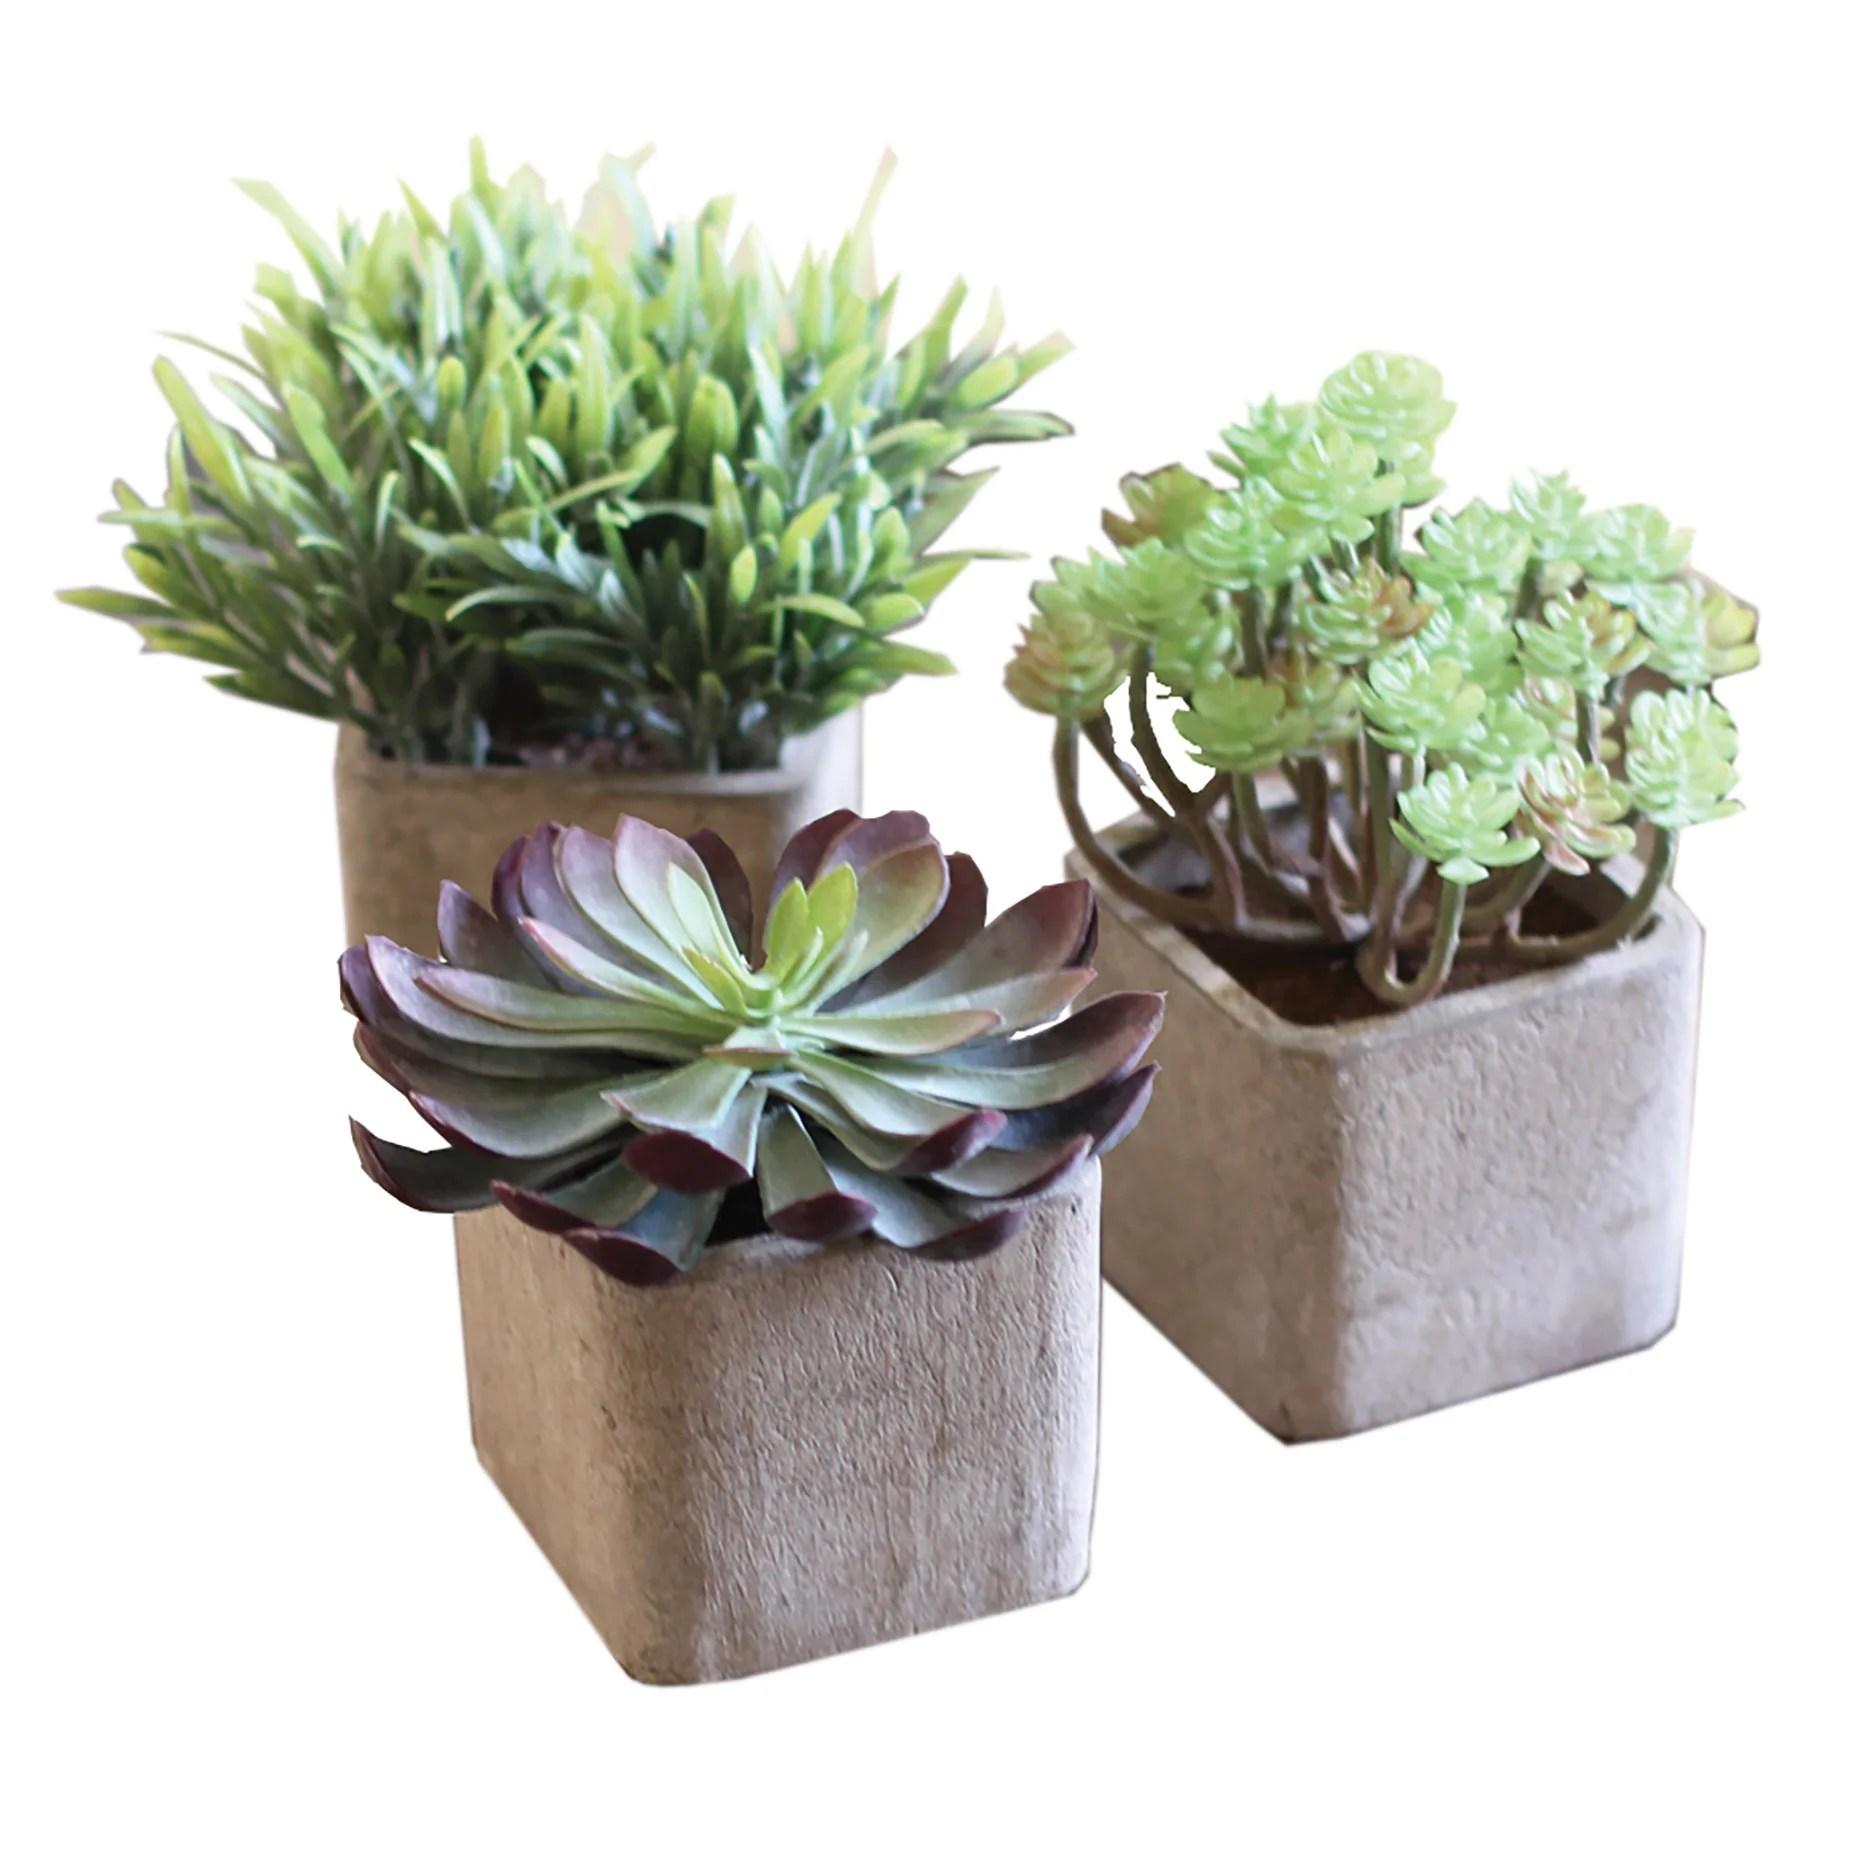 Modern Artificial Succulent Plants in Pots  Set of 3